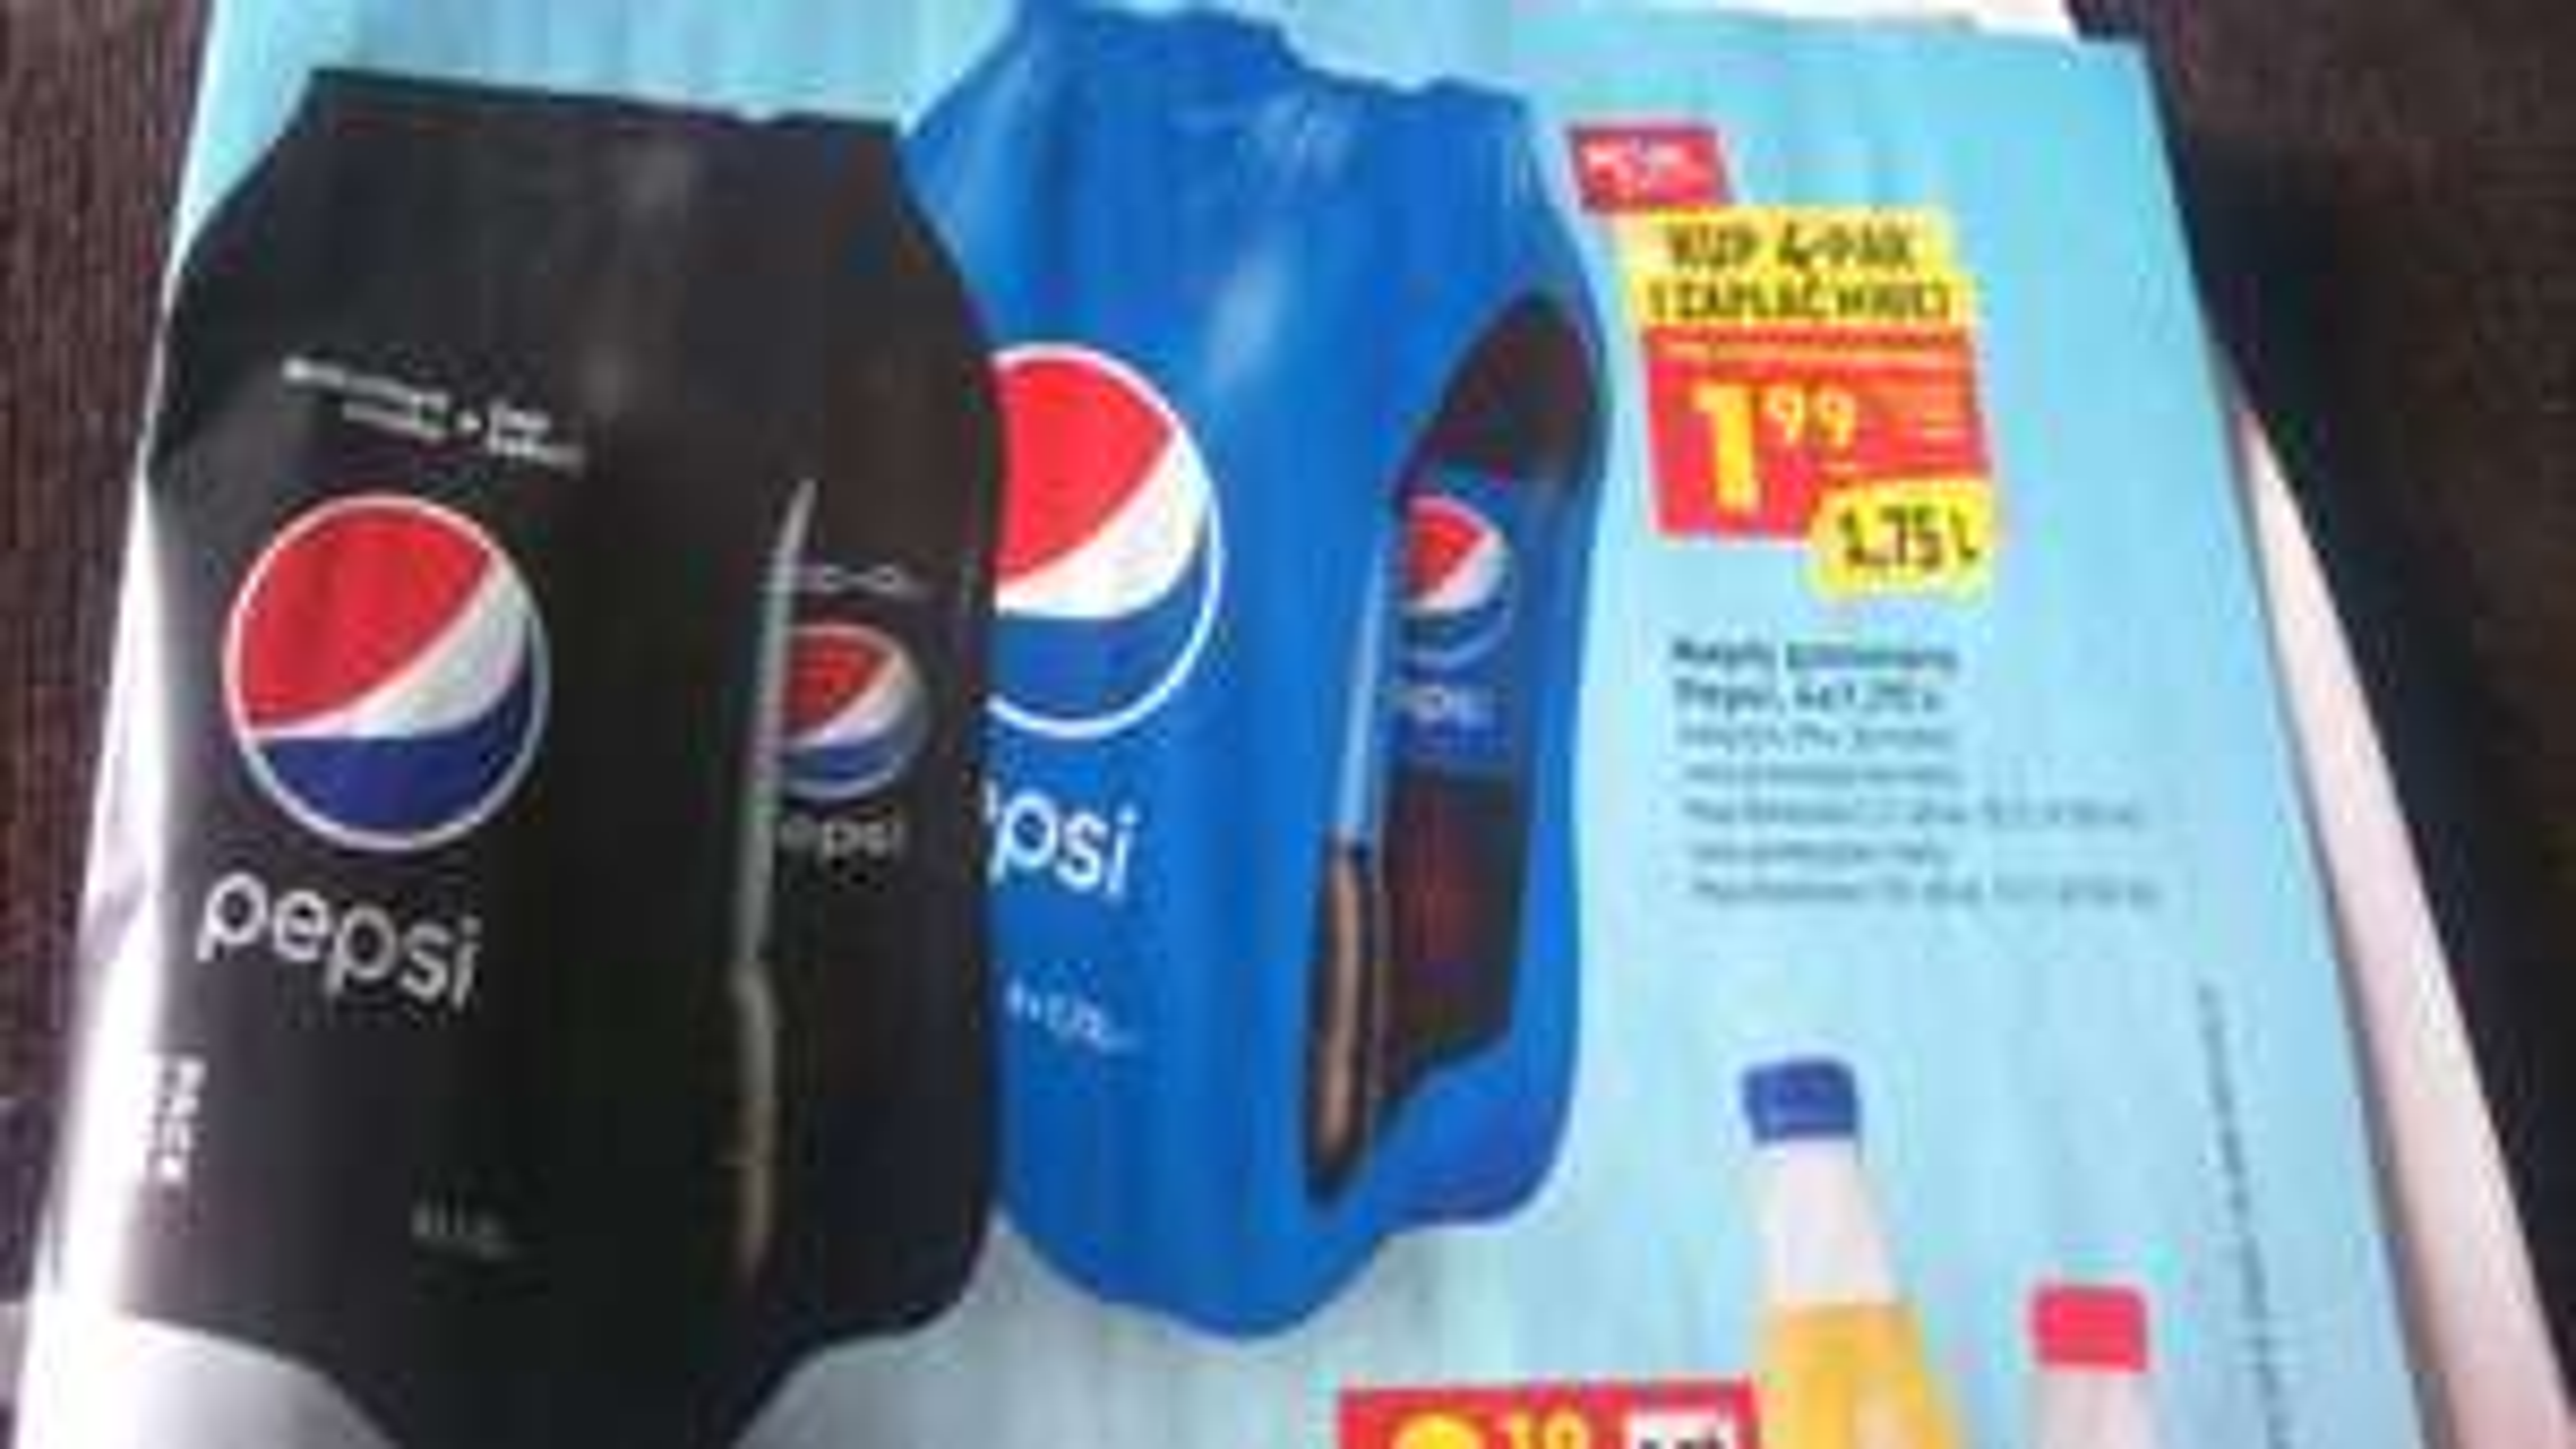 Pepsi, 8 zł za czteropak 5 l, biedronka.